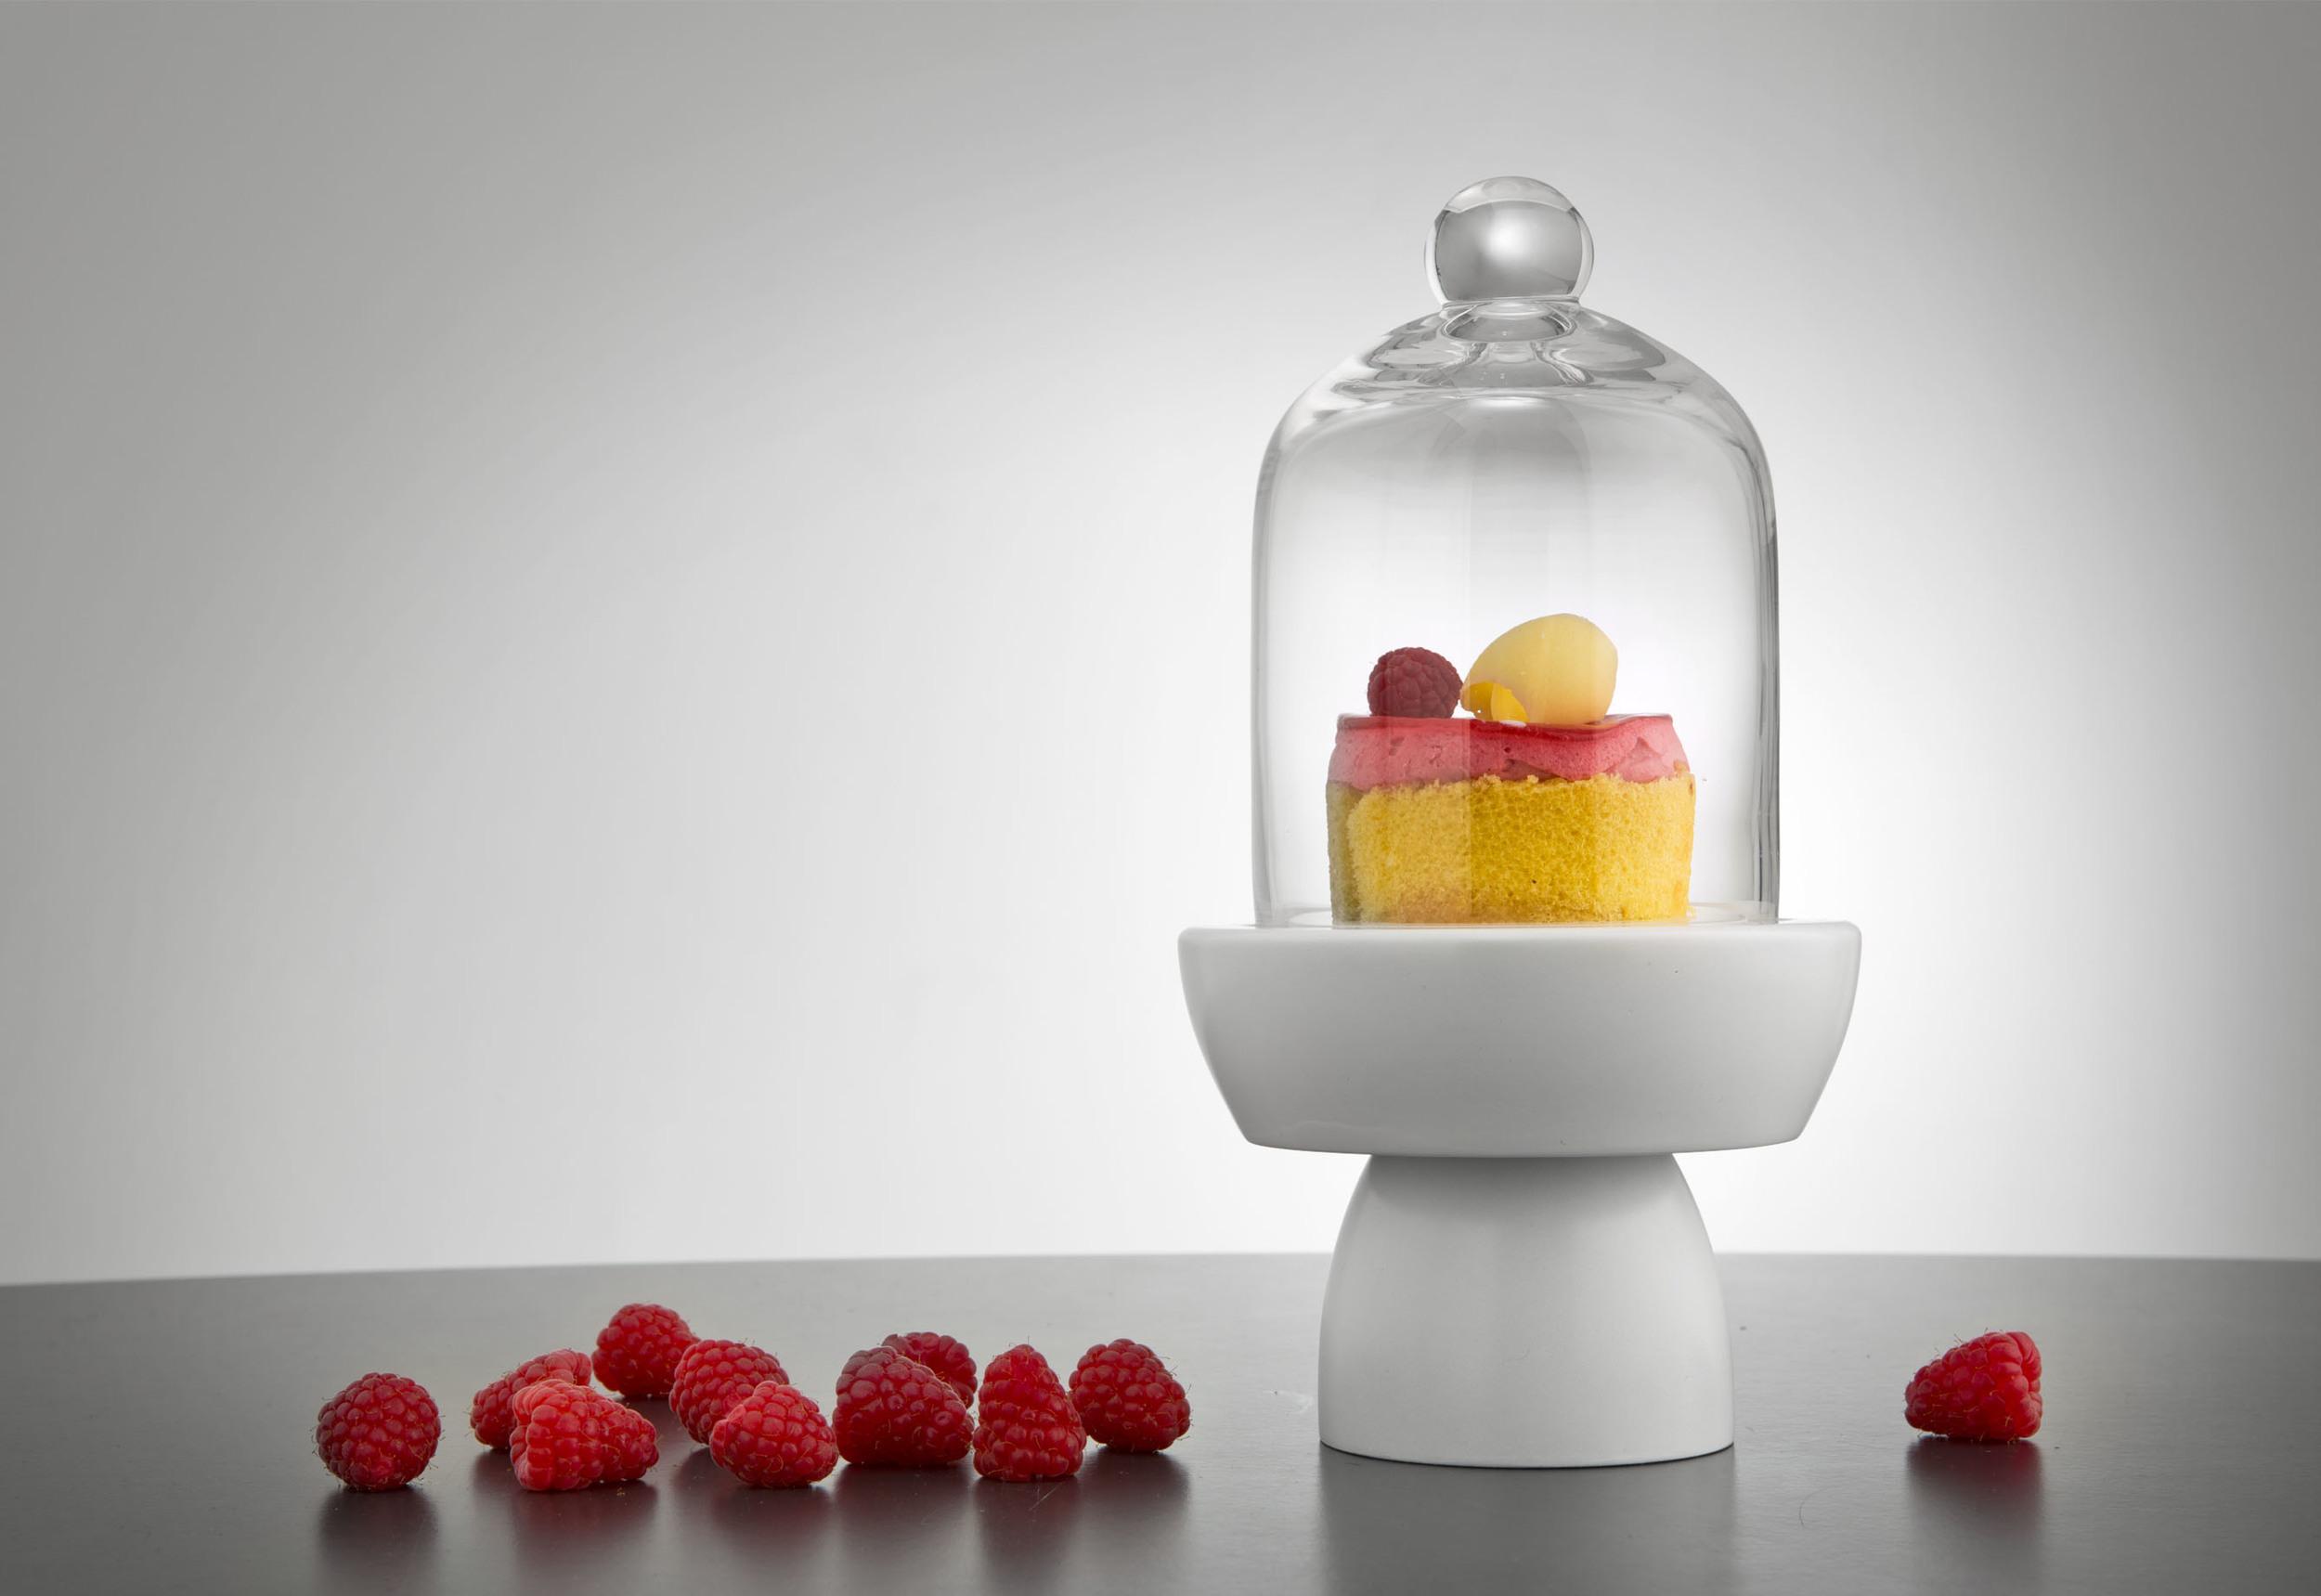 Bubble bliss - dry dessert